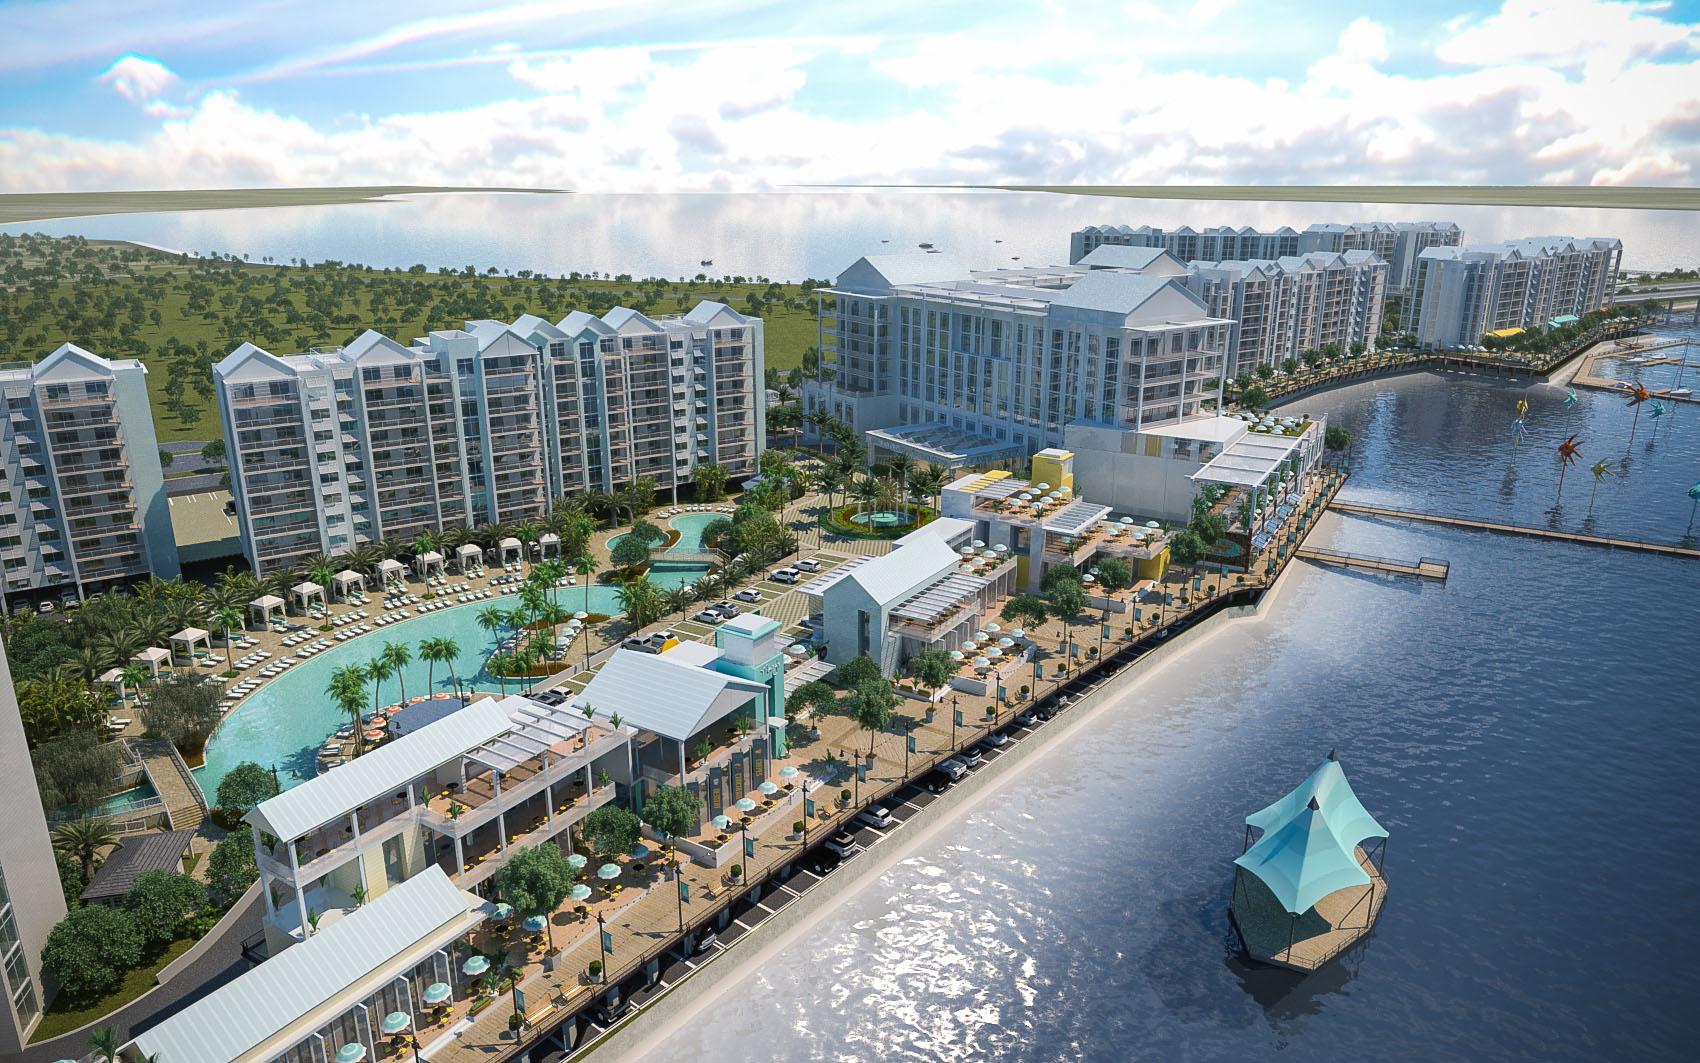 A rendering of an aerial view of Allegiant's Sunseeker Resort.